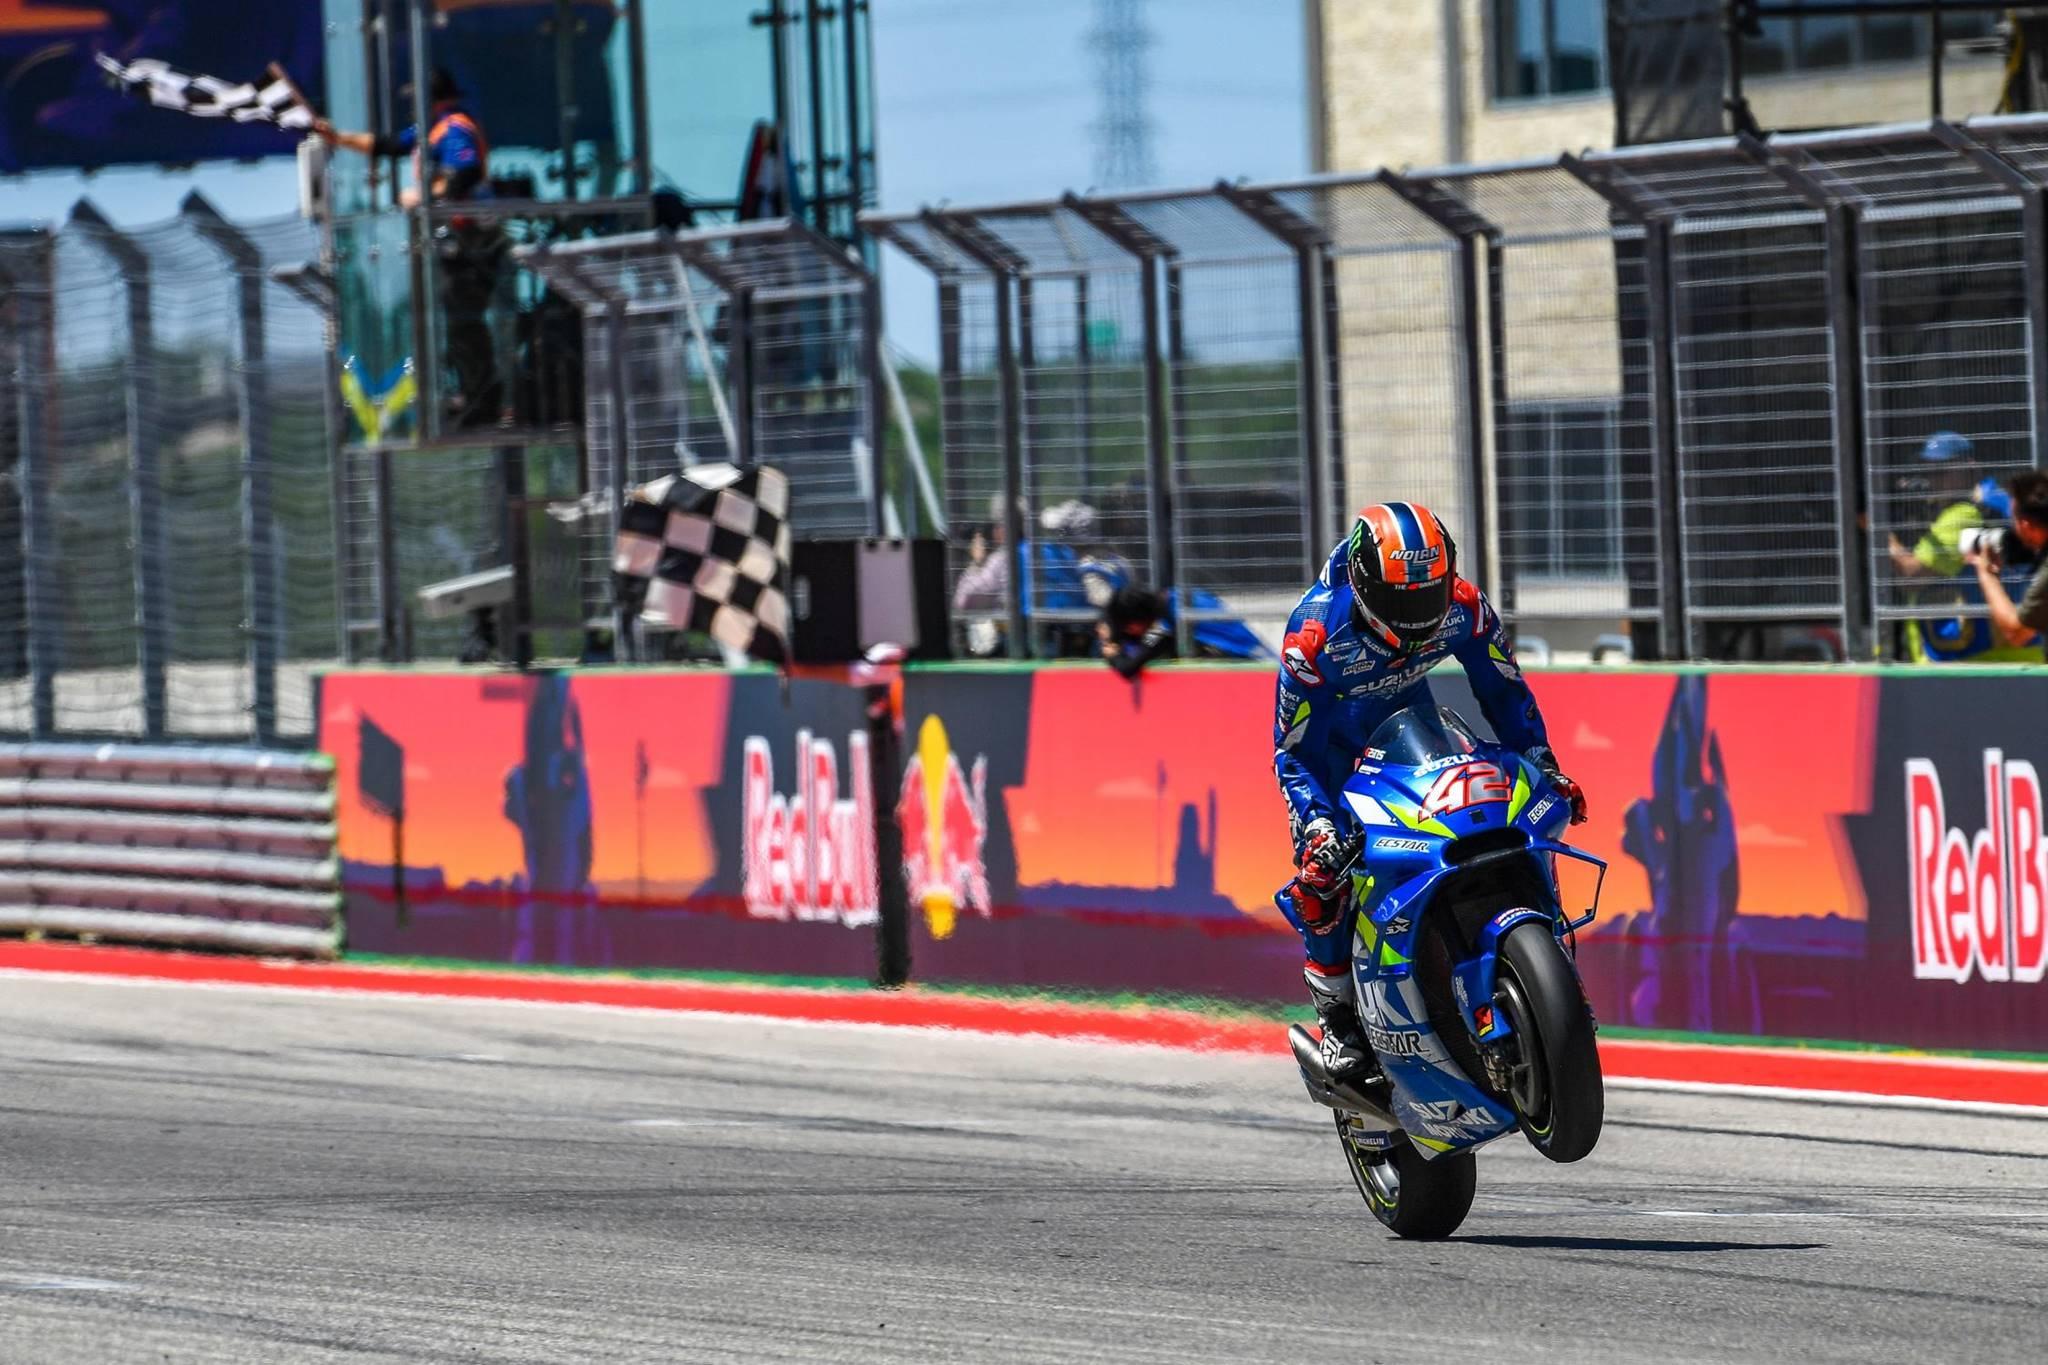 MotoGP_2019_AmericasGP_Xe_Tinhte_030.jpg